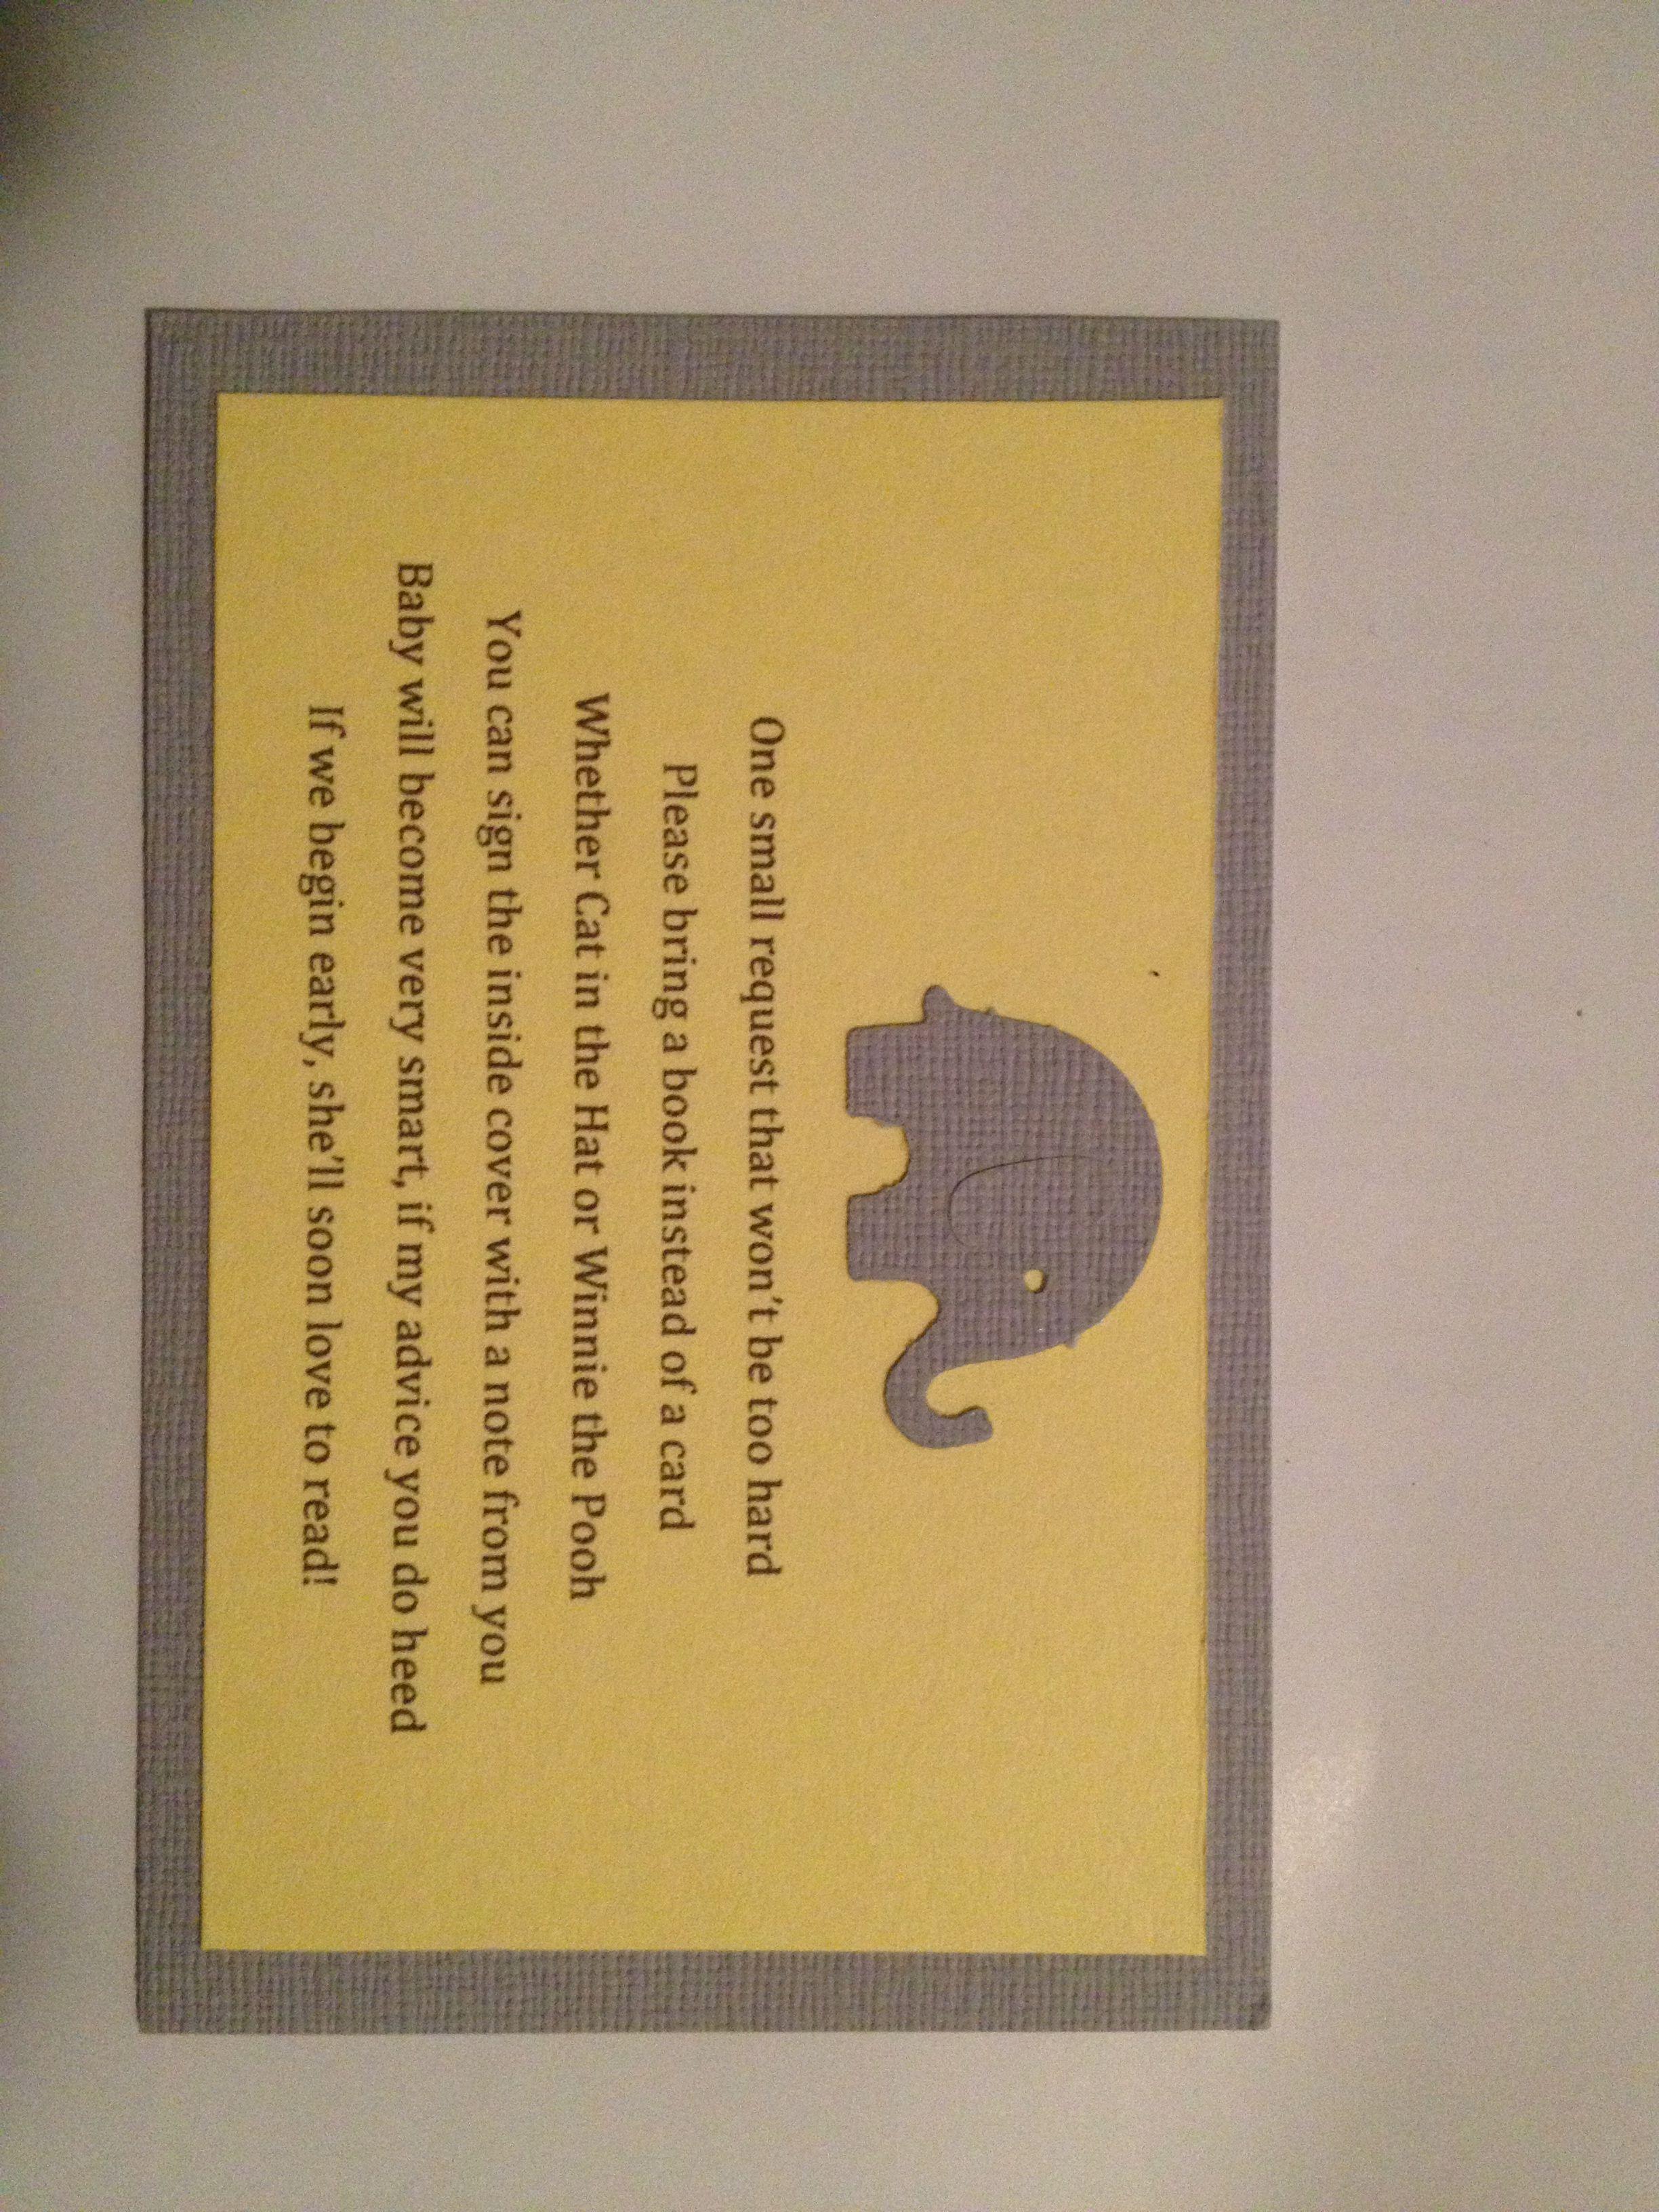 Baby Shower Book Poem Insert Choice Image Baby Shower Ideas